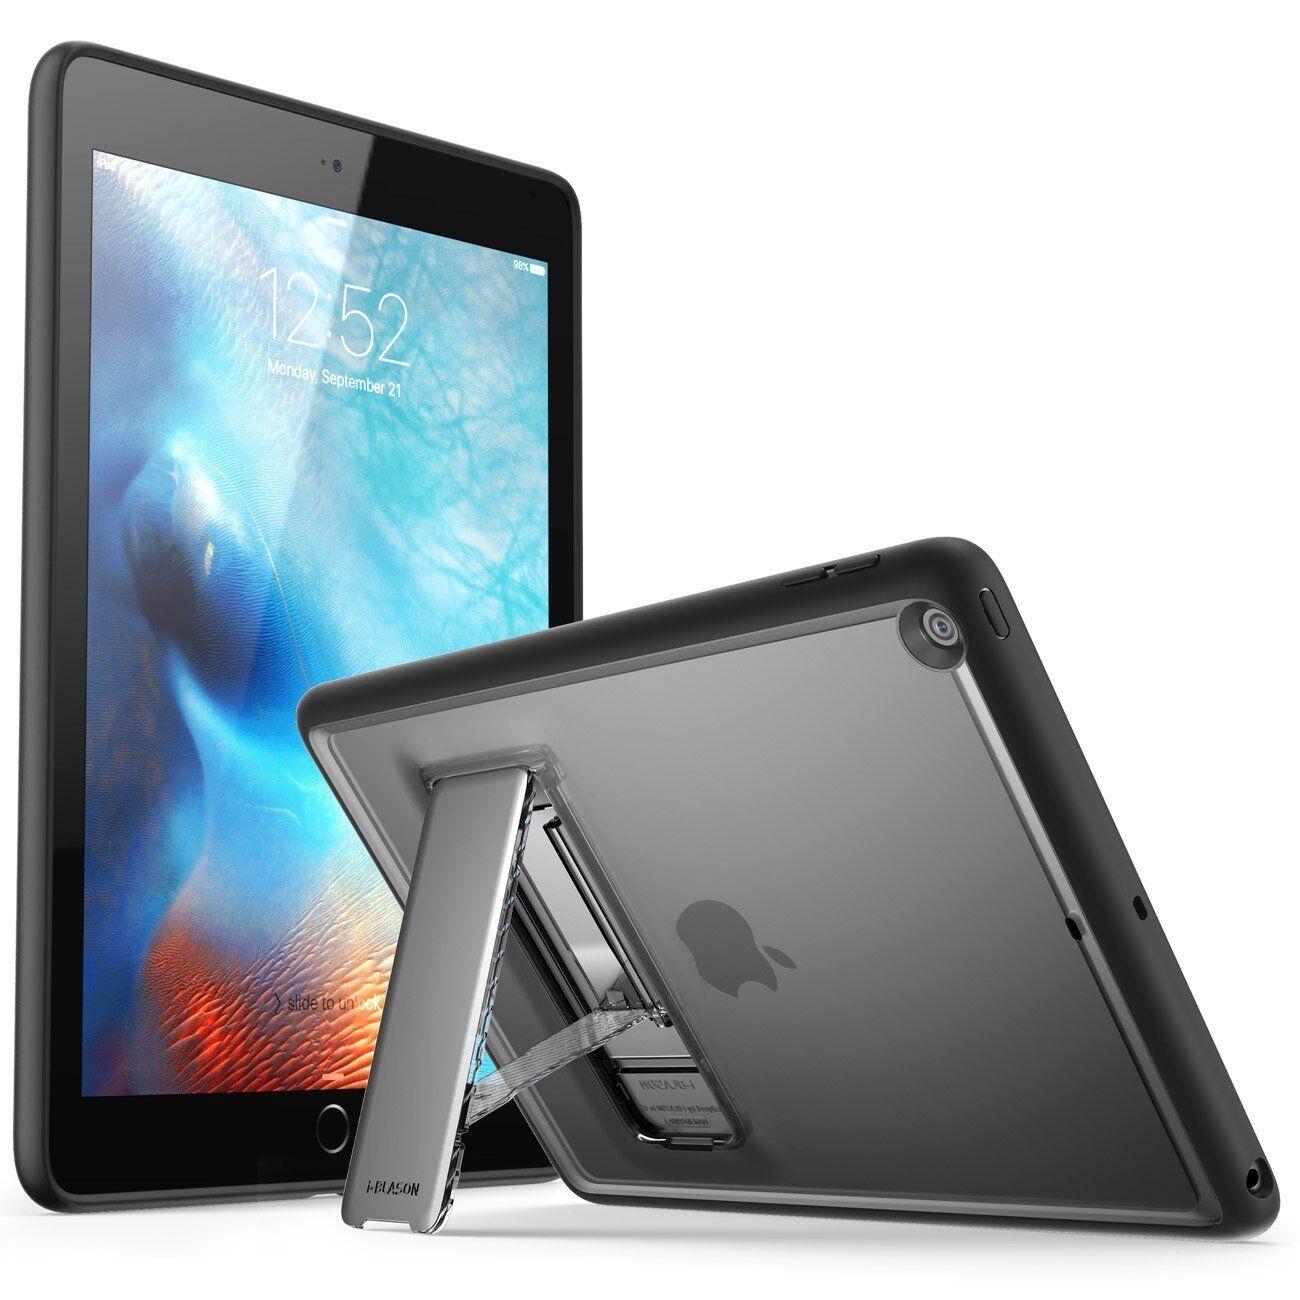 iPad 9.7 2017 2018 Case i-Blason Halo Slim Hybrid Protective